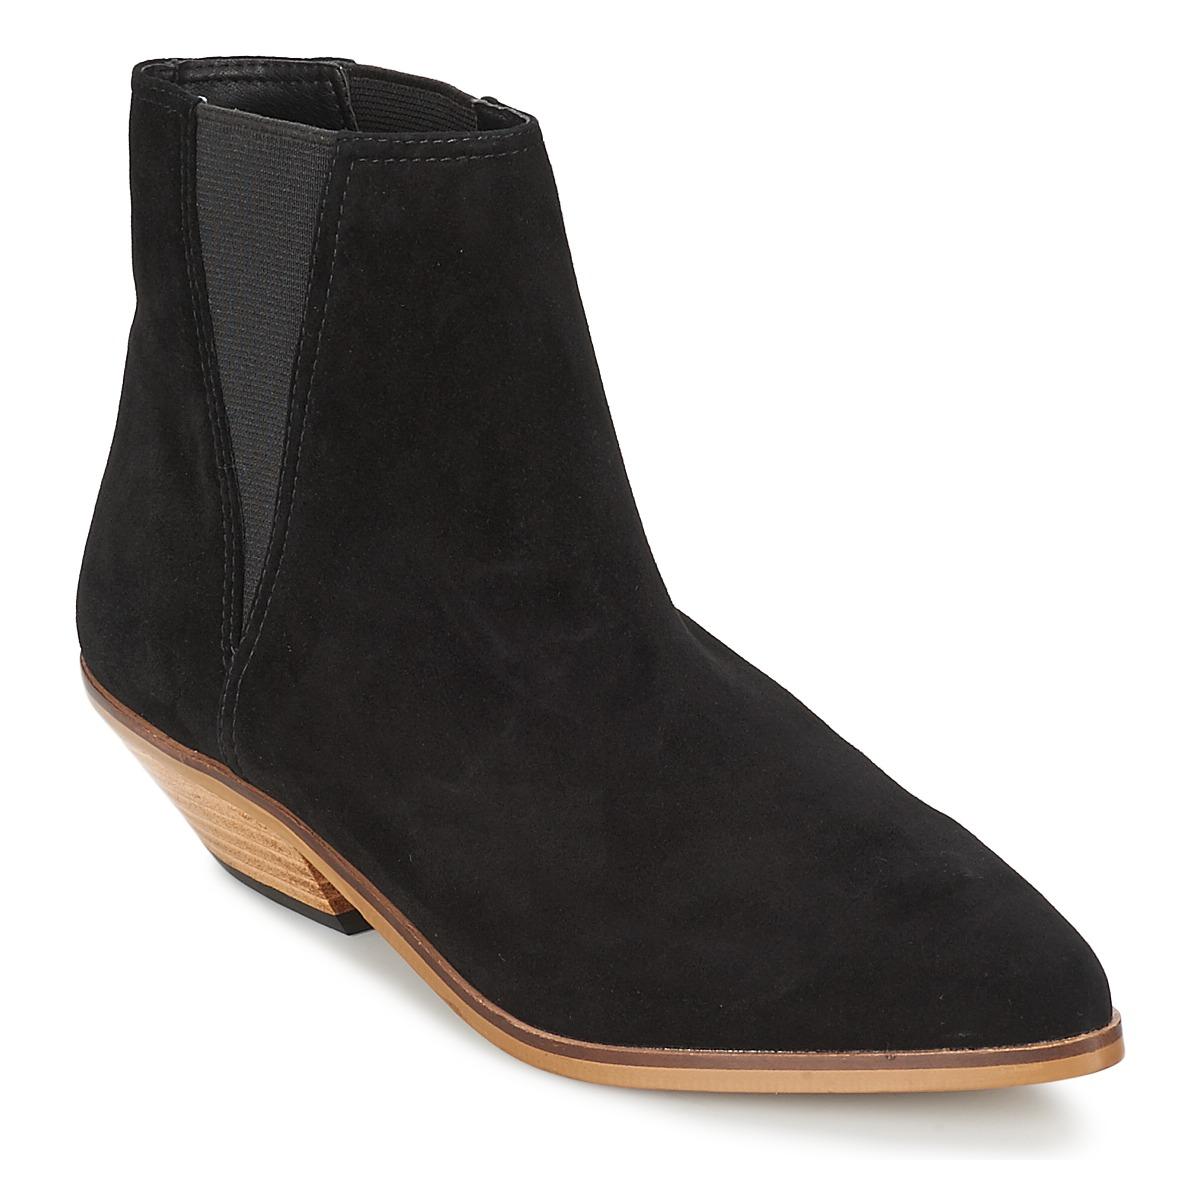 Shellys London CHAN Schwarz - Kostenloser Versand bei Spartoode ! - Schuhe Boots Damen 50,00 €